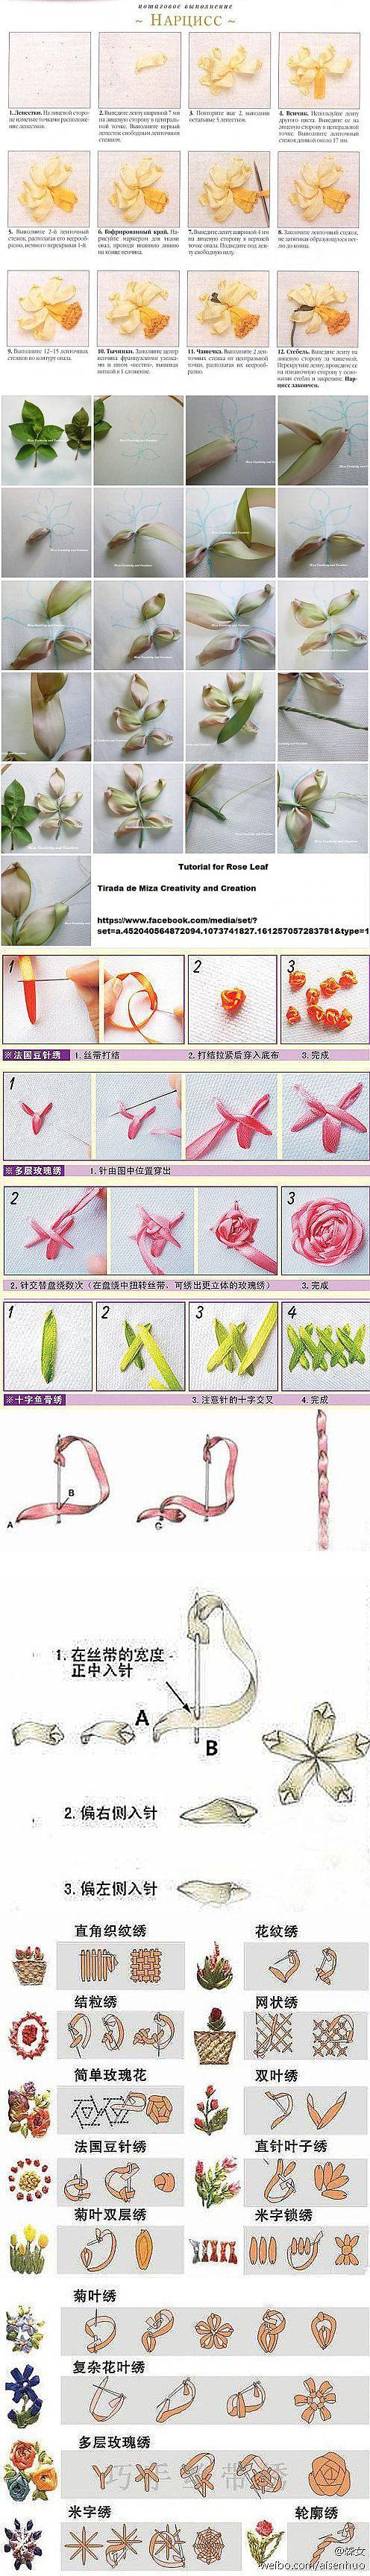 fljuida.com ribbon embroidery